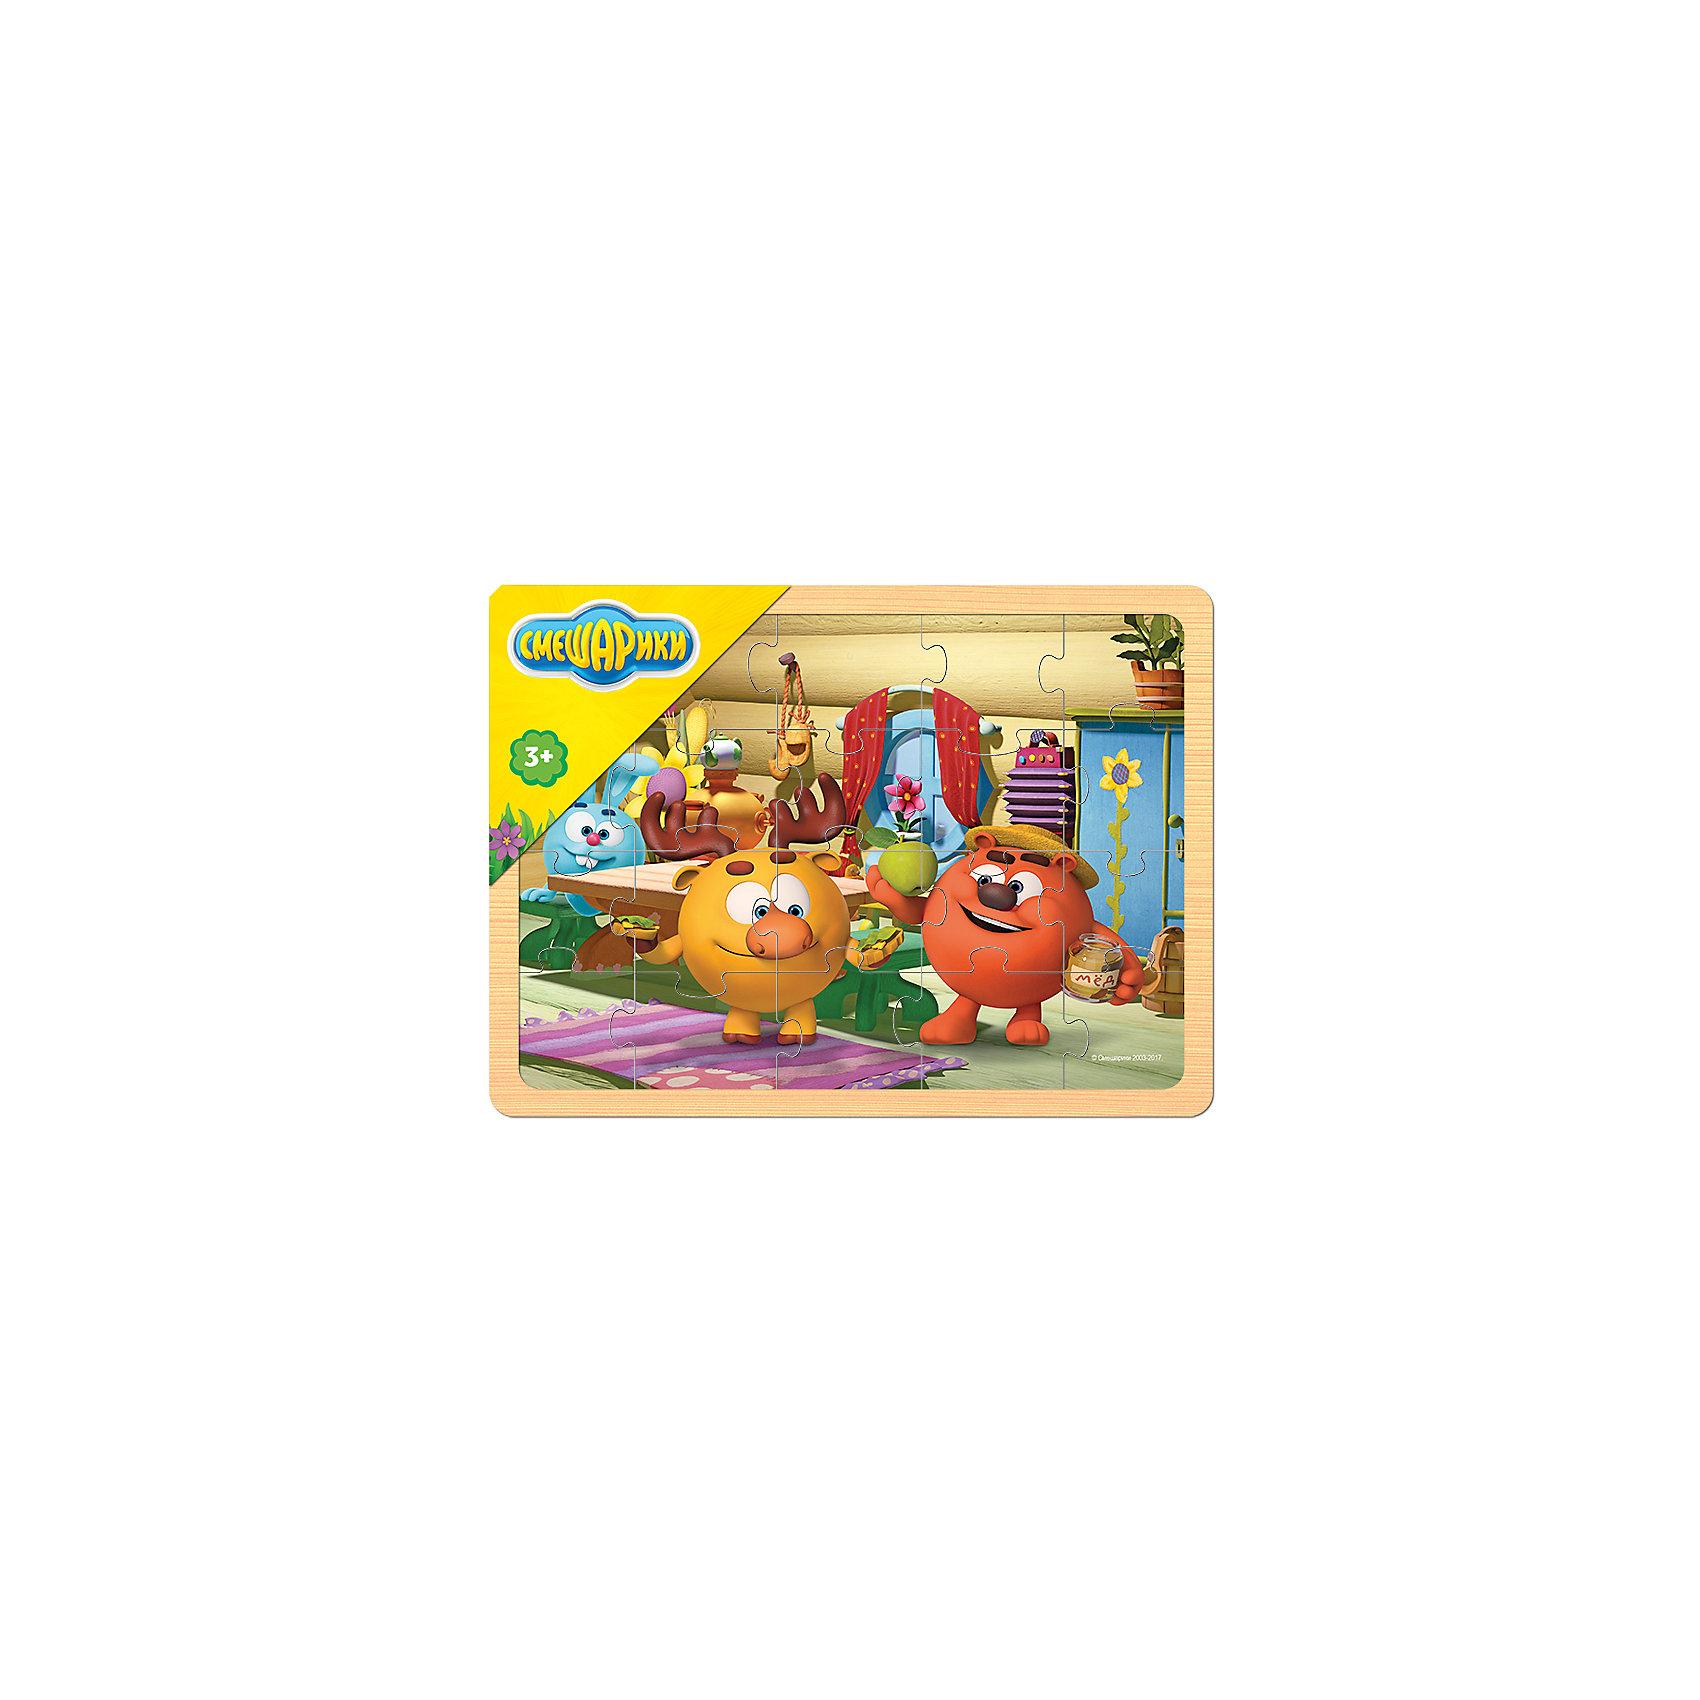 Игра из дерева Смешарики, Step PuzzleПазлы для малышей<br><br><br>Ширина мм: 298<br>Глубина мм: 220<br>Высота мм: 8<br>Вес г: 380<br>Возраст от месяцев: 36<br>Возраст до месяцев: 2147483647<br>Пол: Унисекс<br>Возраст: Детский<br>SKU: 6894237